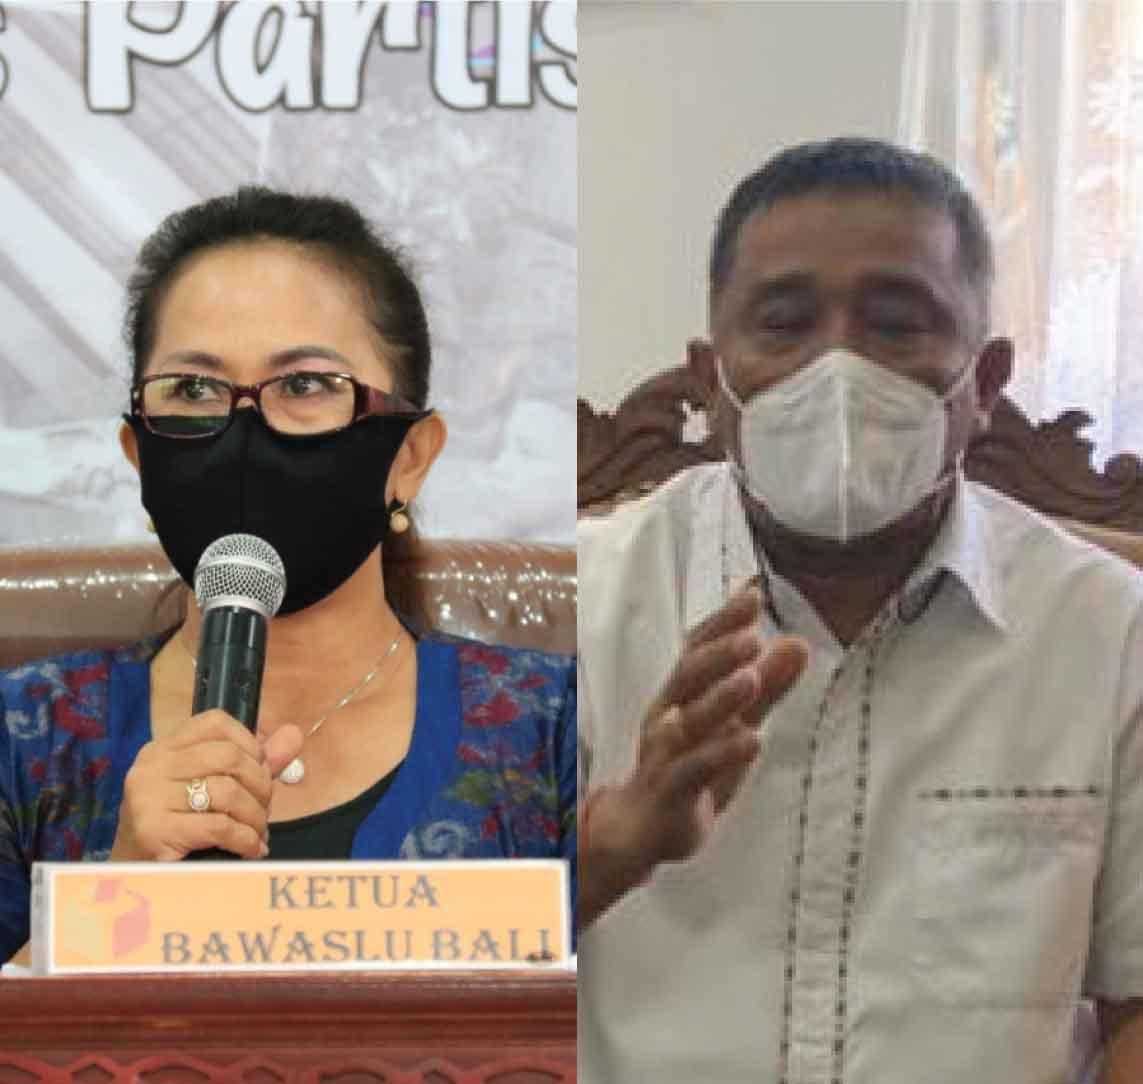 Ketut Ariyani dan Lidartawan. Foto: hen